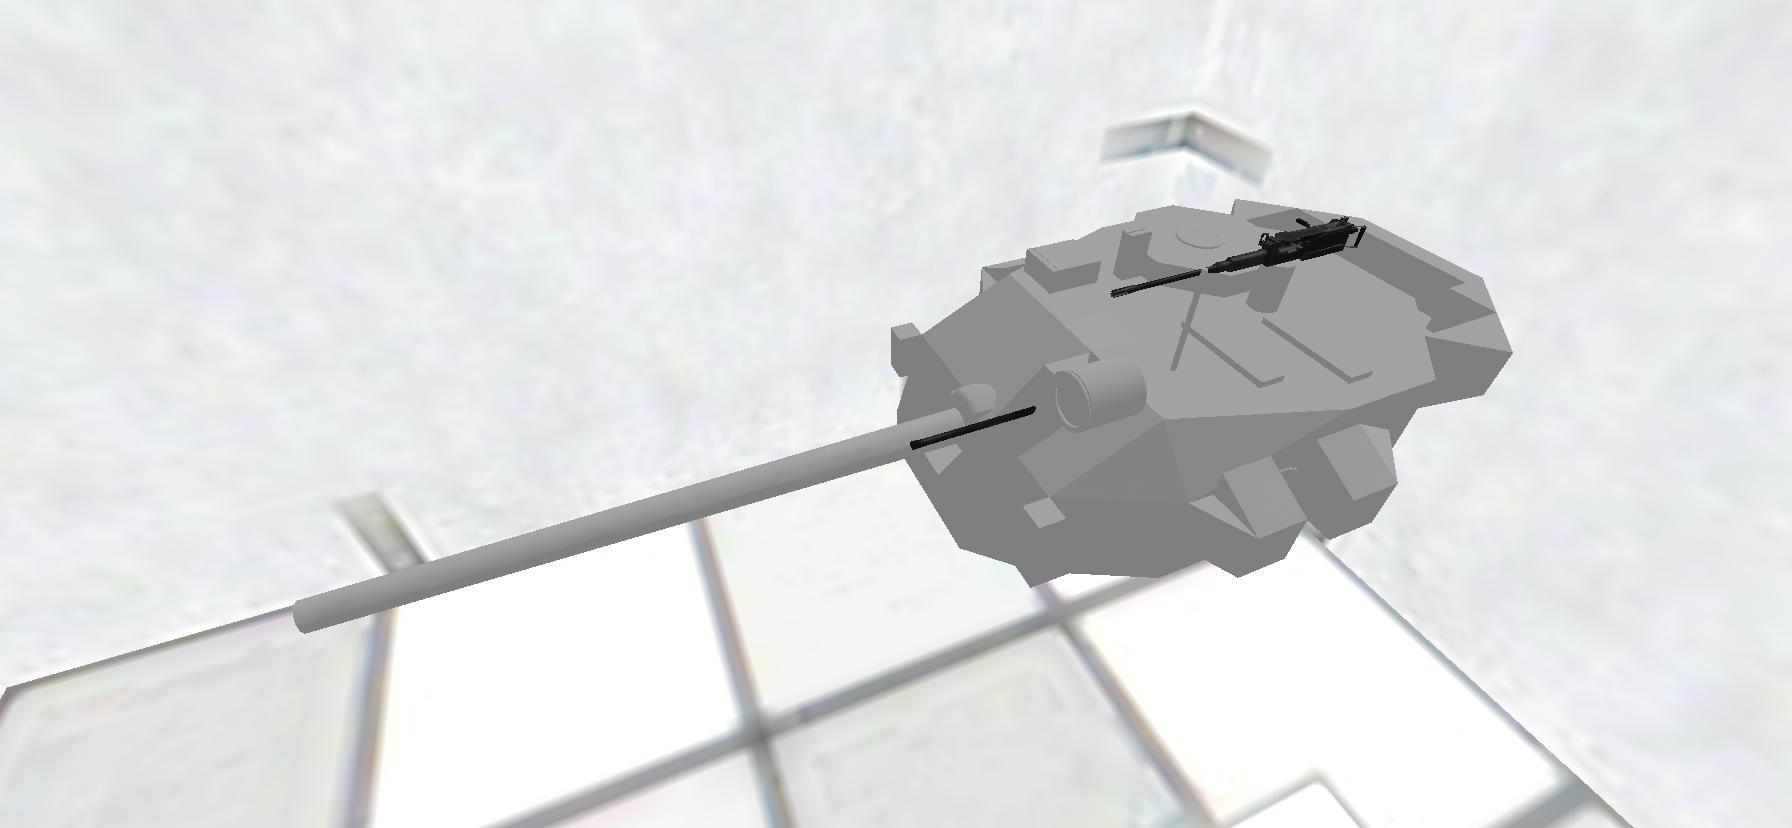 Centurion AX Turret